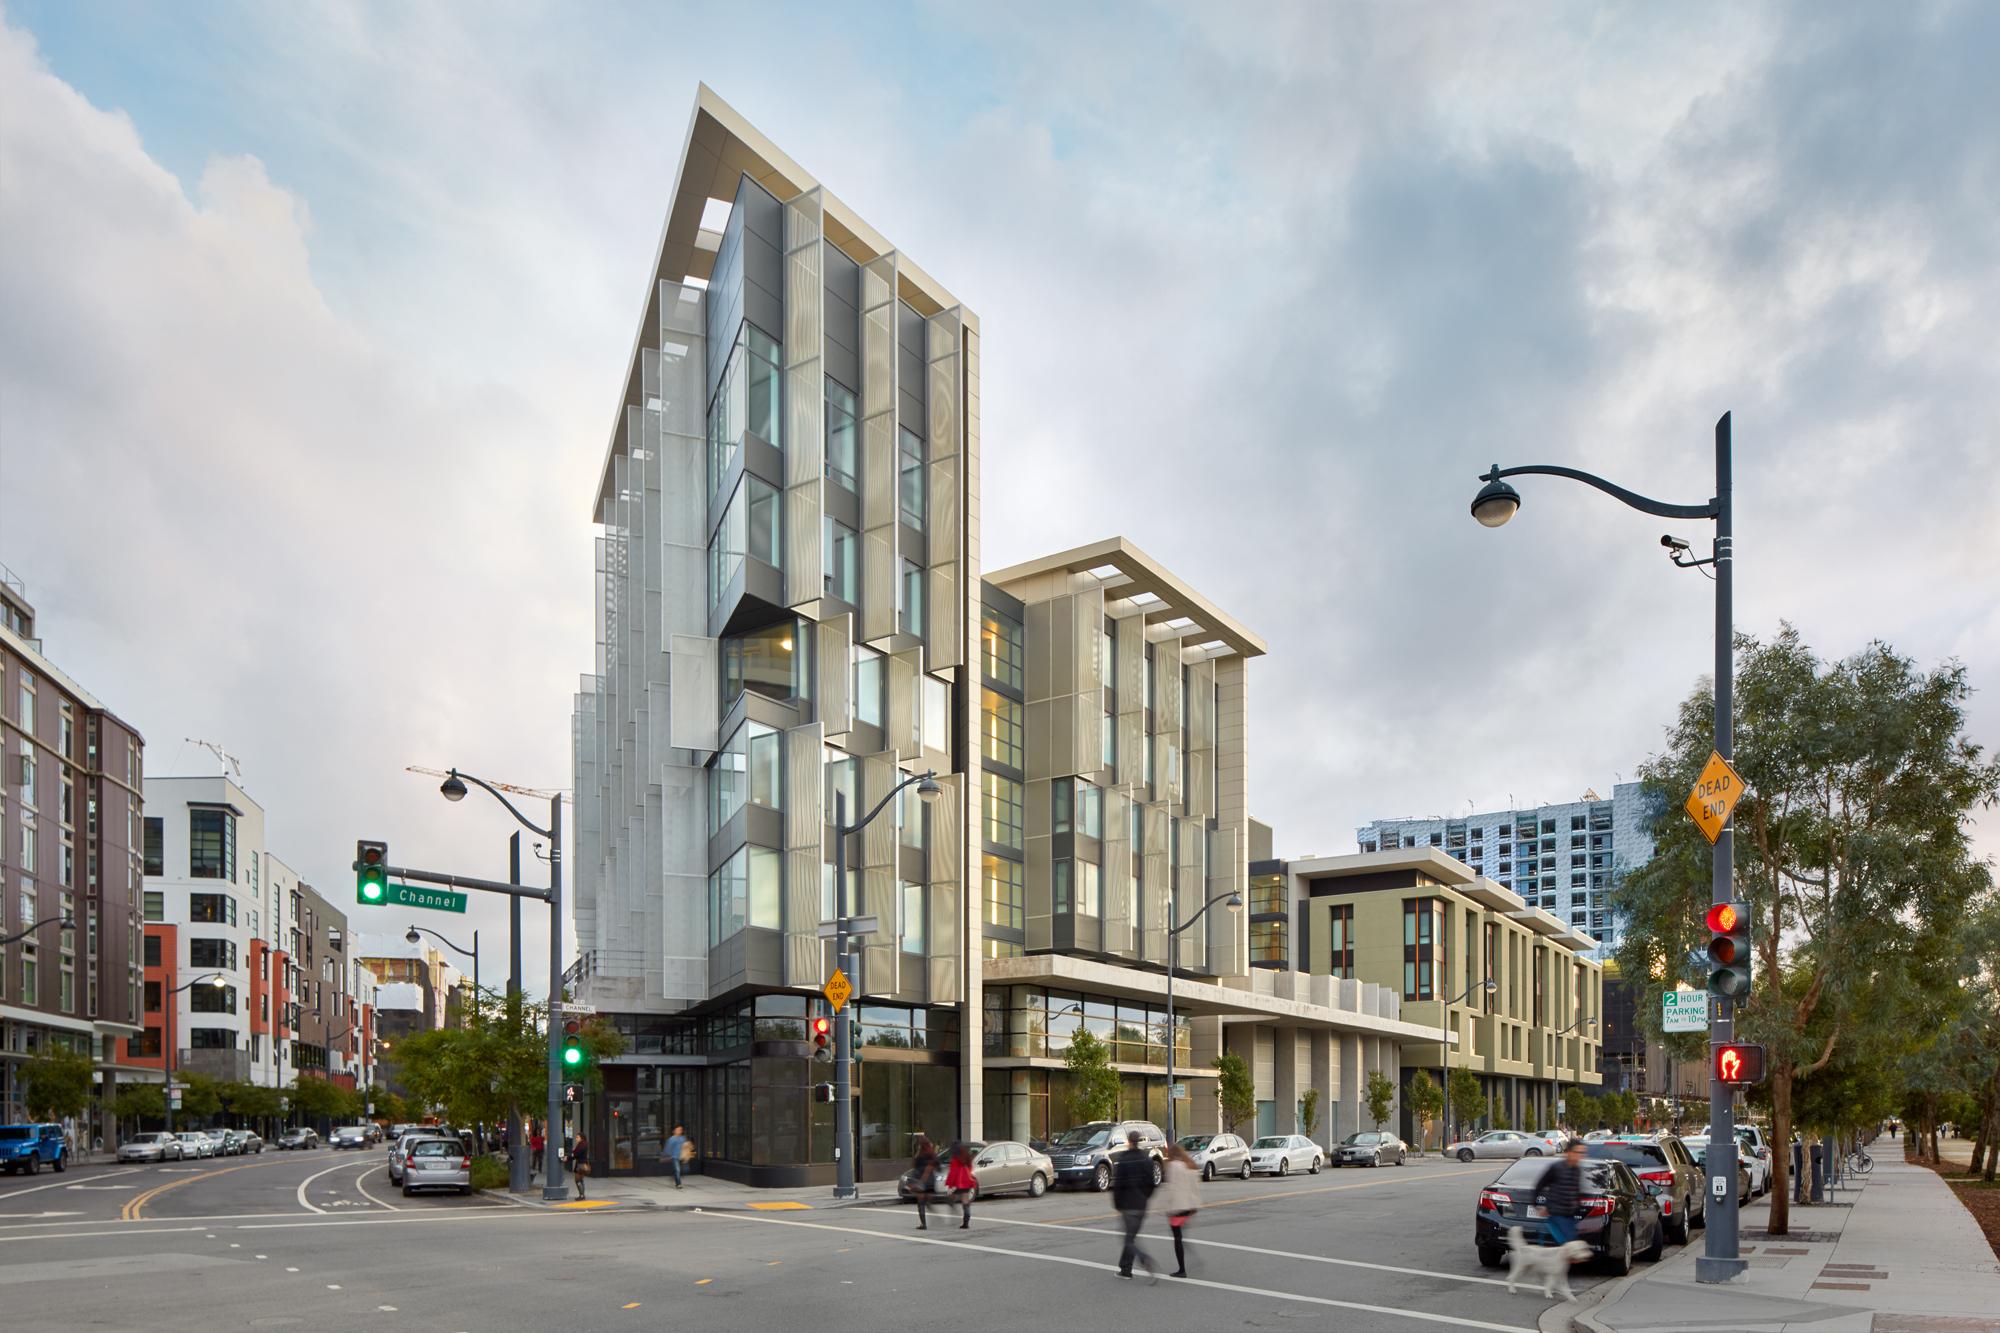 1180 Fourth Street Apartments by Mithun. Photo ©  Bruce Damonte